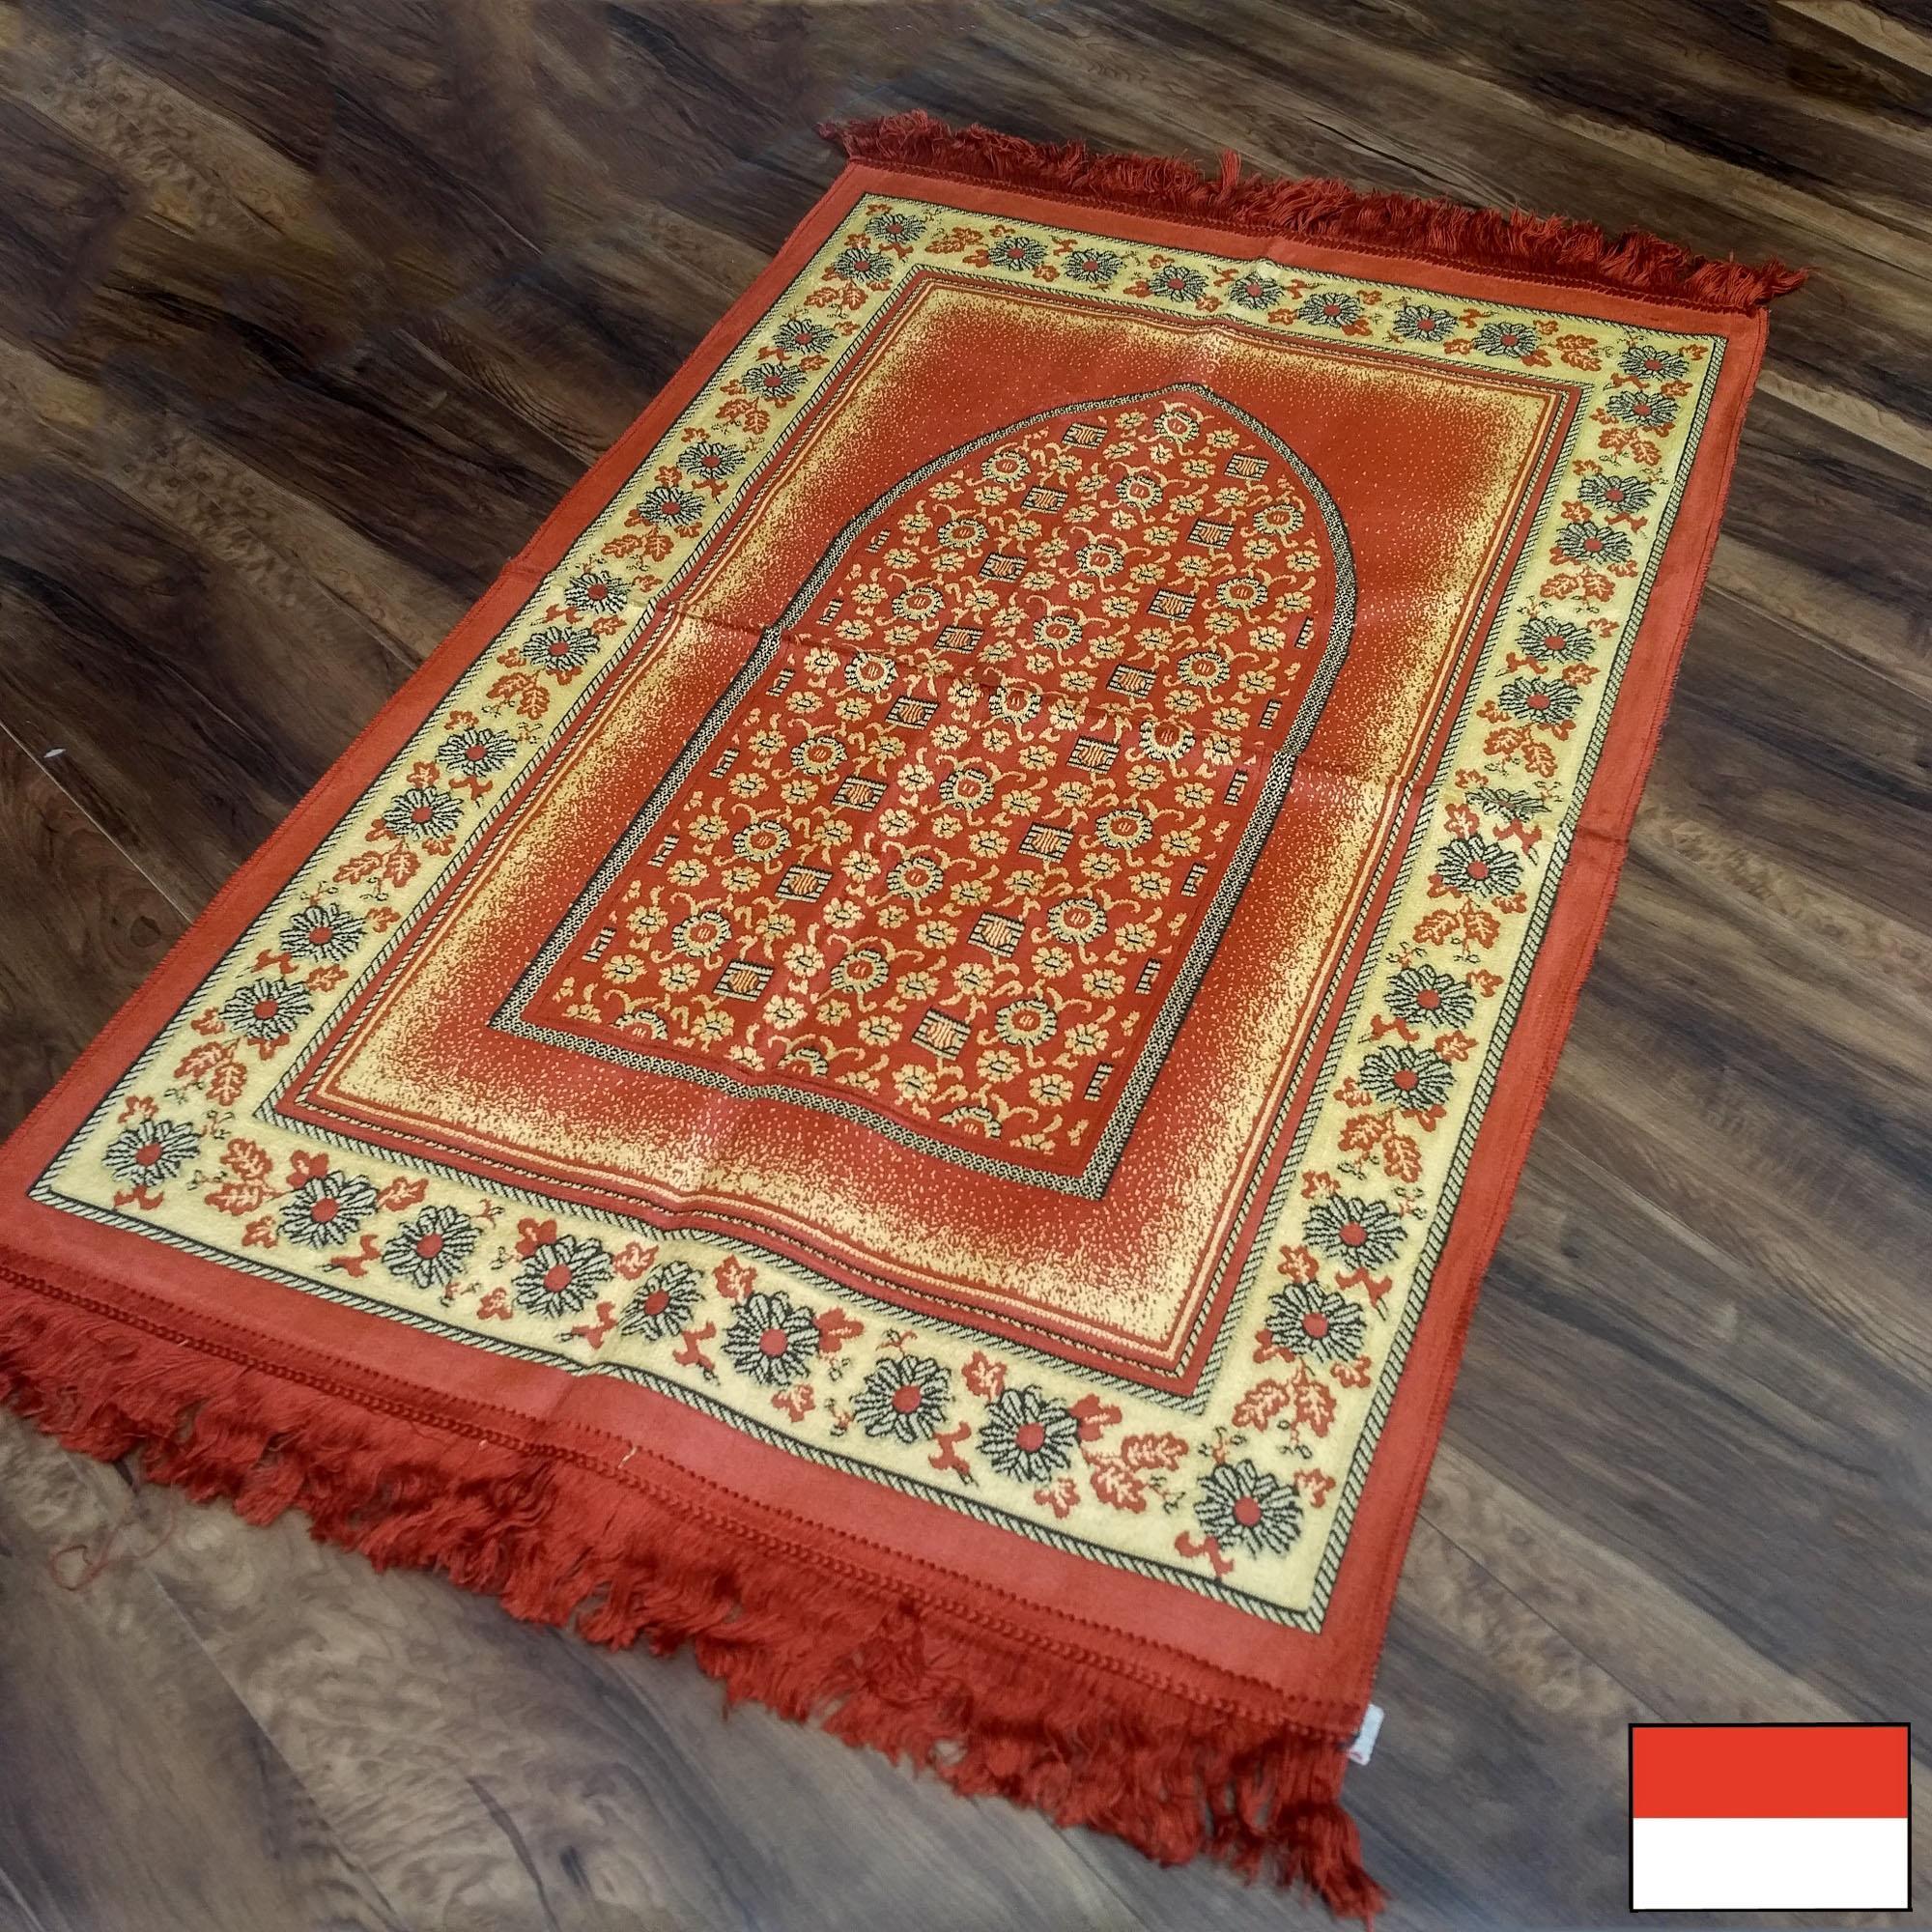 Al-Shiraz - Sajadah Turki  Beludru / Bulu 68 cm x 110 cm - Orange 01ORG - NMs